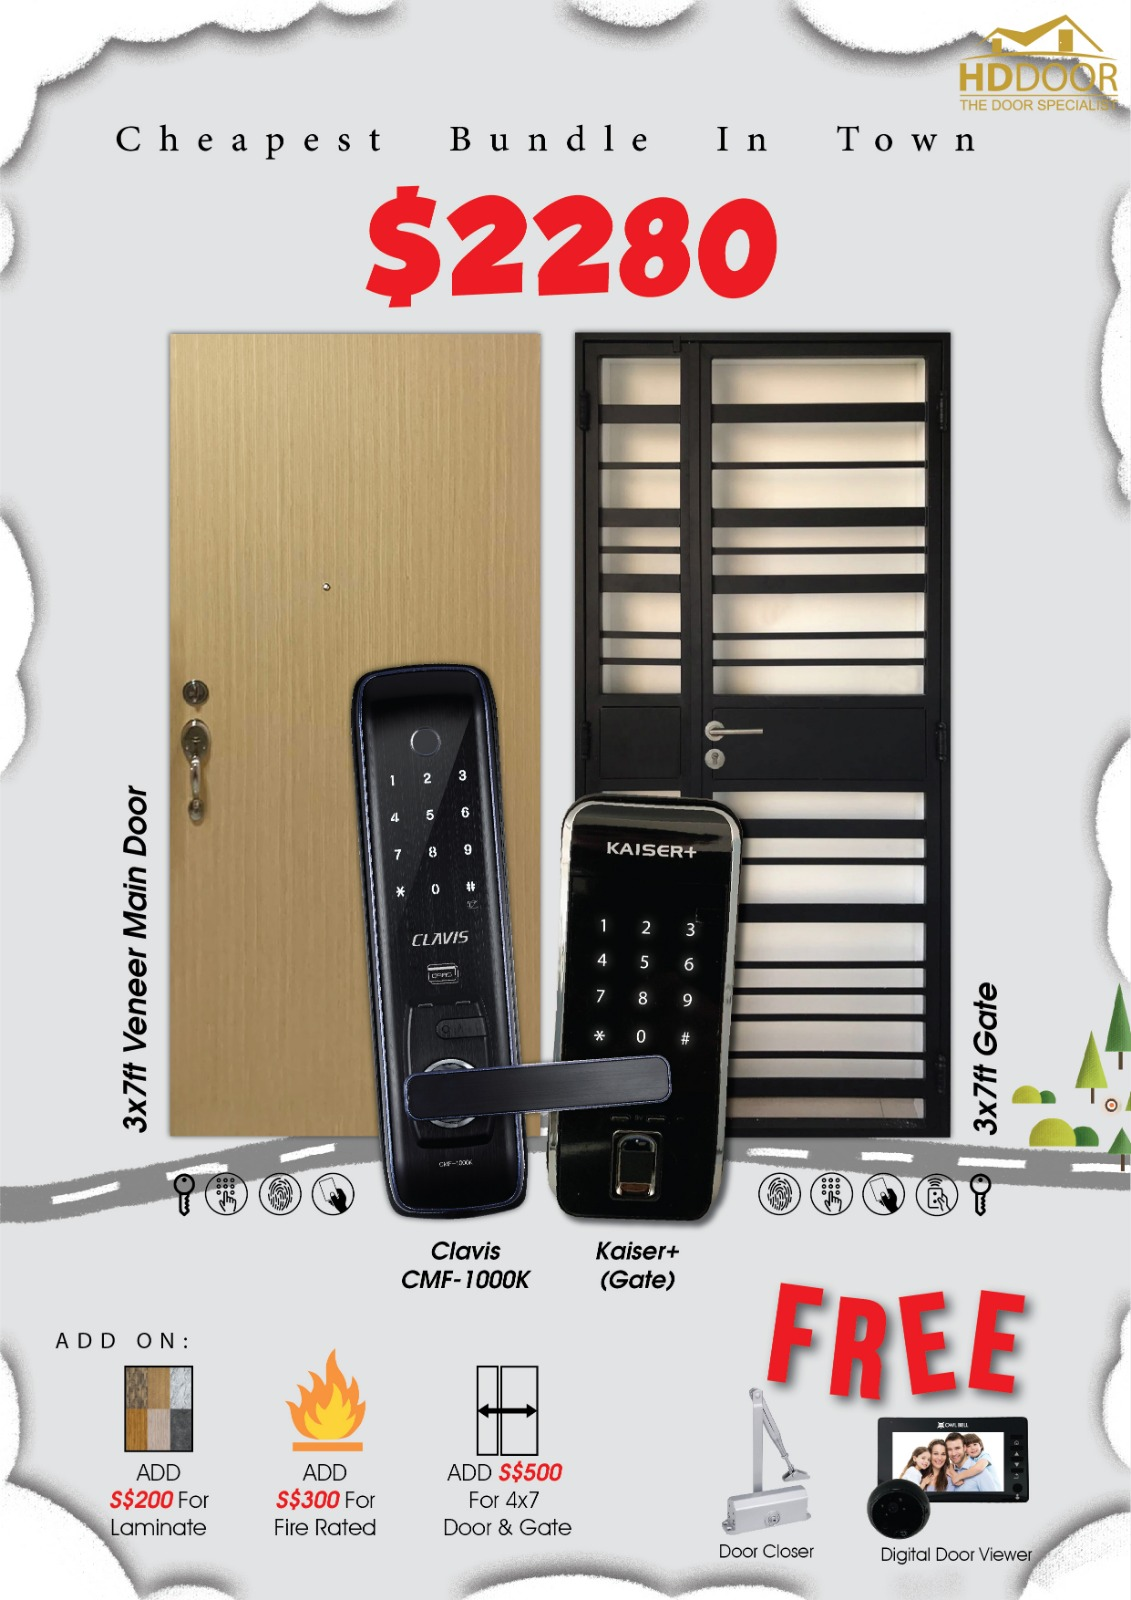 Cheapest Bundle Promotion 2020 | Why Not Deals 2 & Promotions